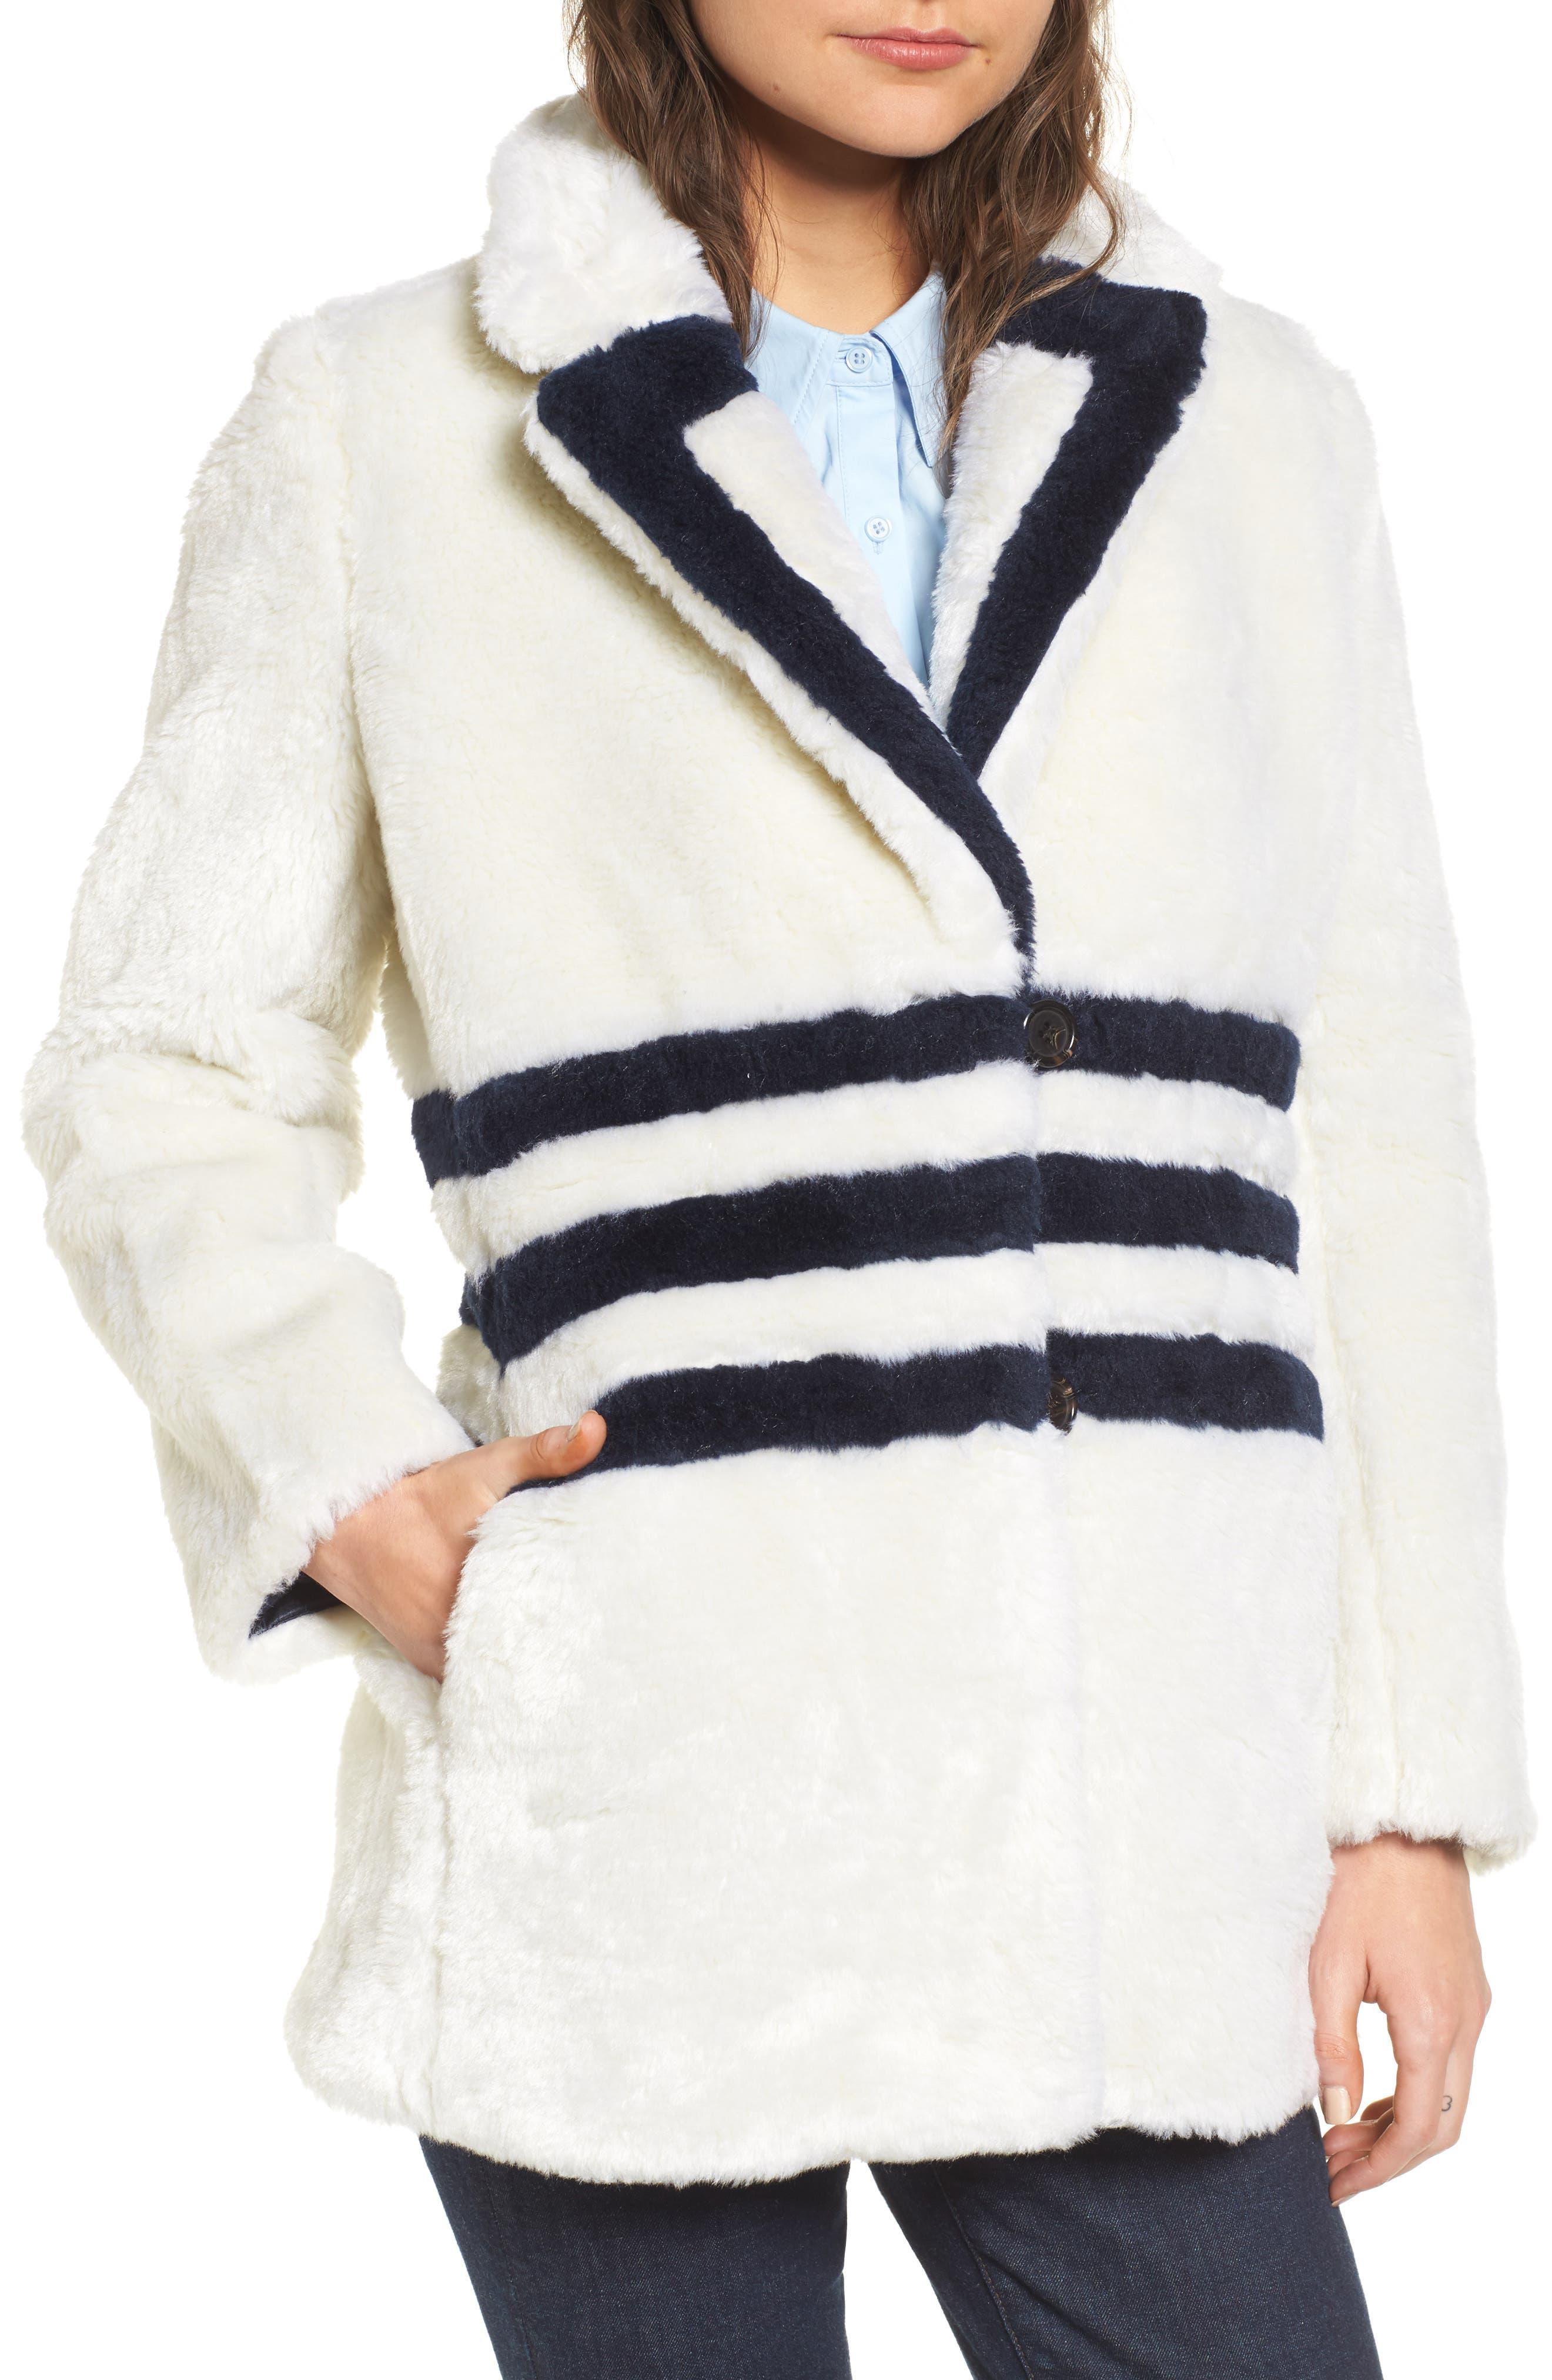 J.Crew Yuna Teddy Faux Fur Jacket,                             Alternate thumbnail 4, color,                             Ivory/ Navy